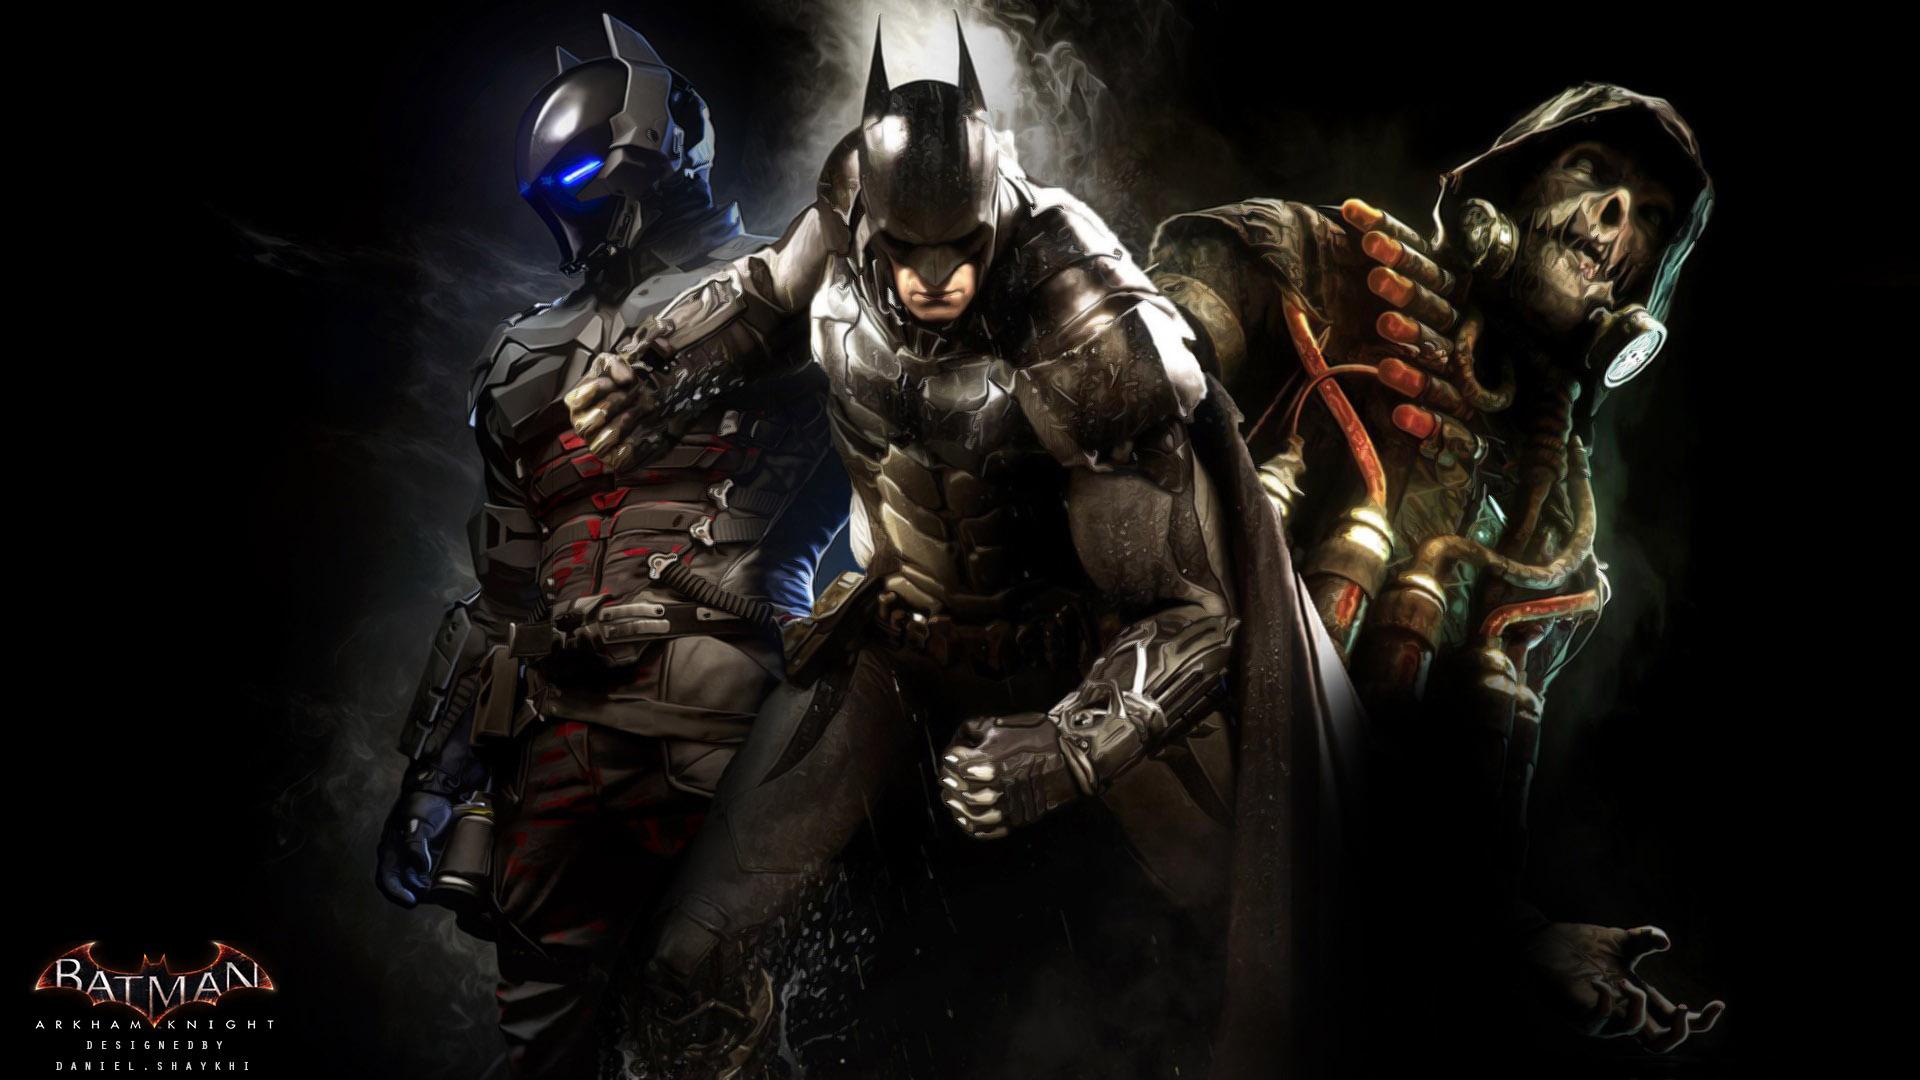 Batman Arkham Knight iin getiimiz gn iki dakikalk mthi 1920x1080